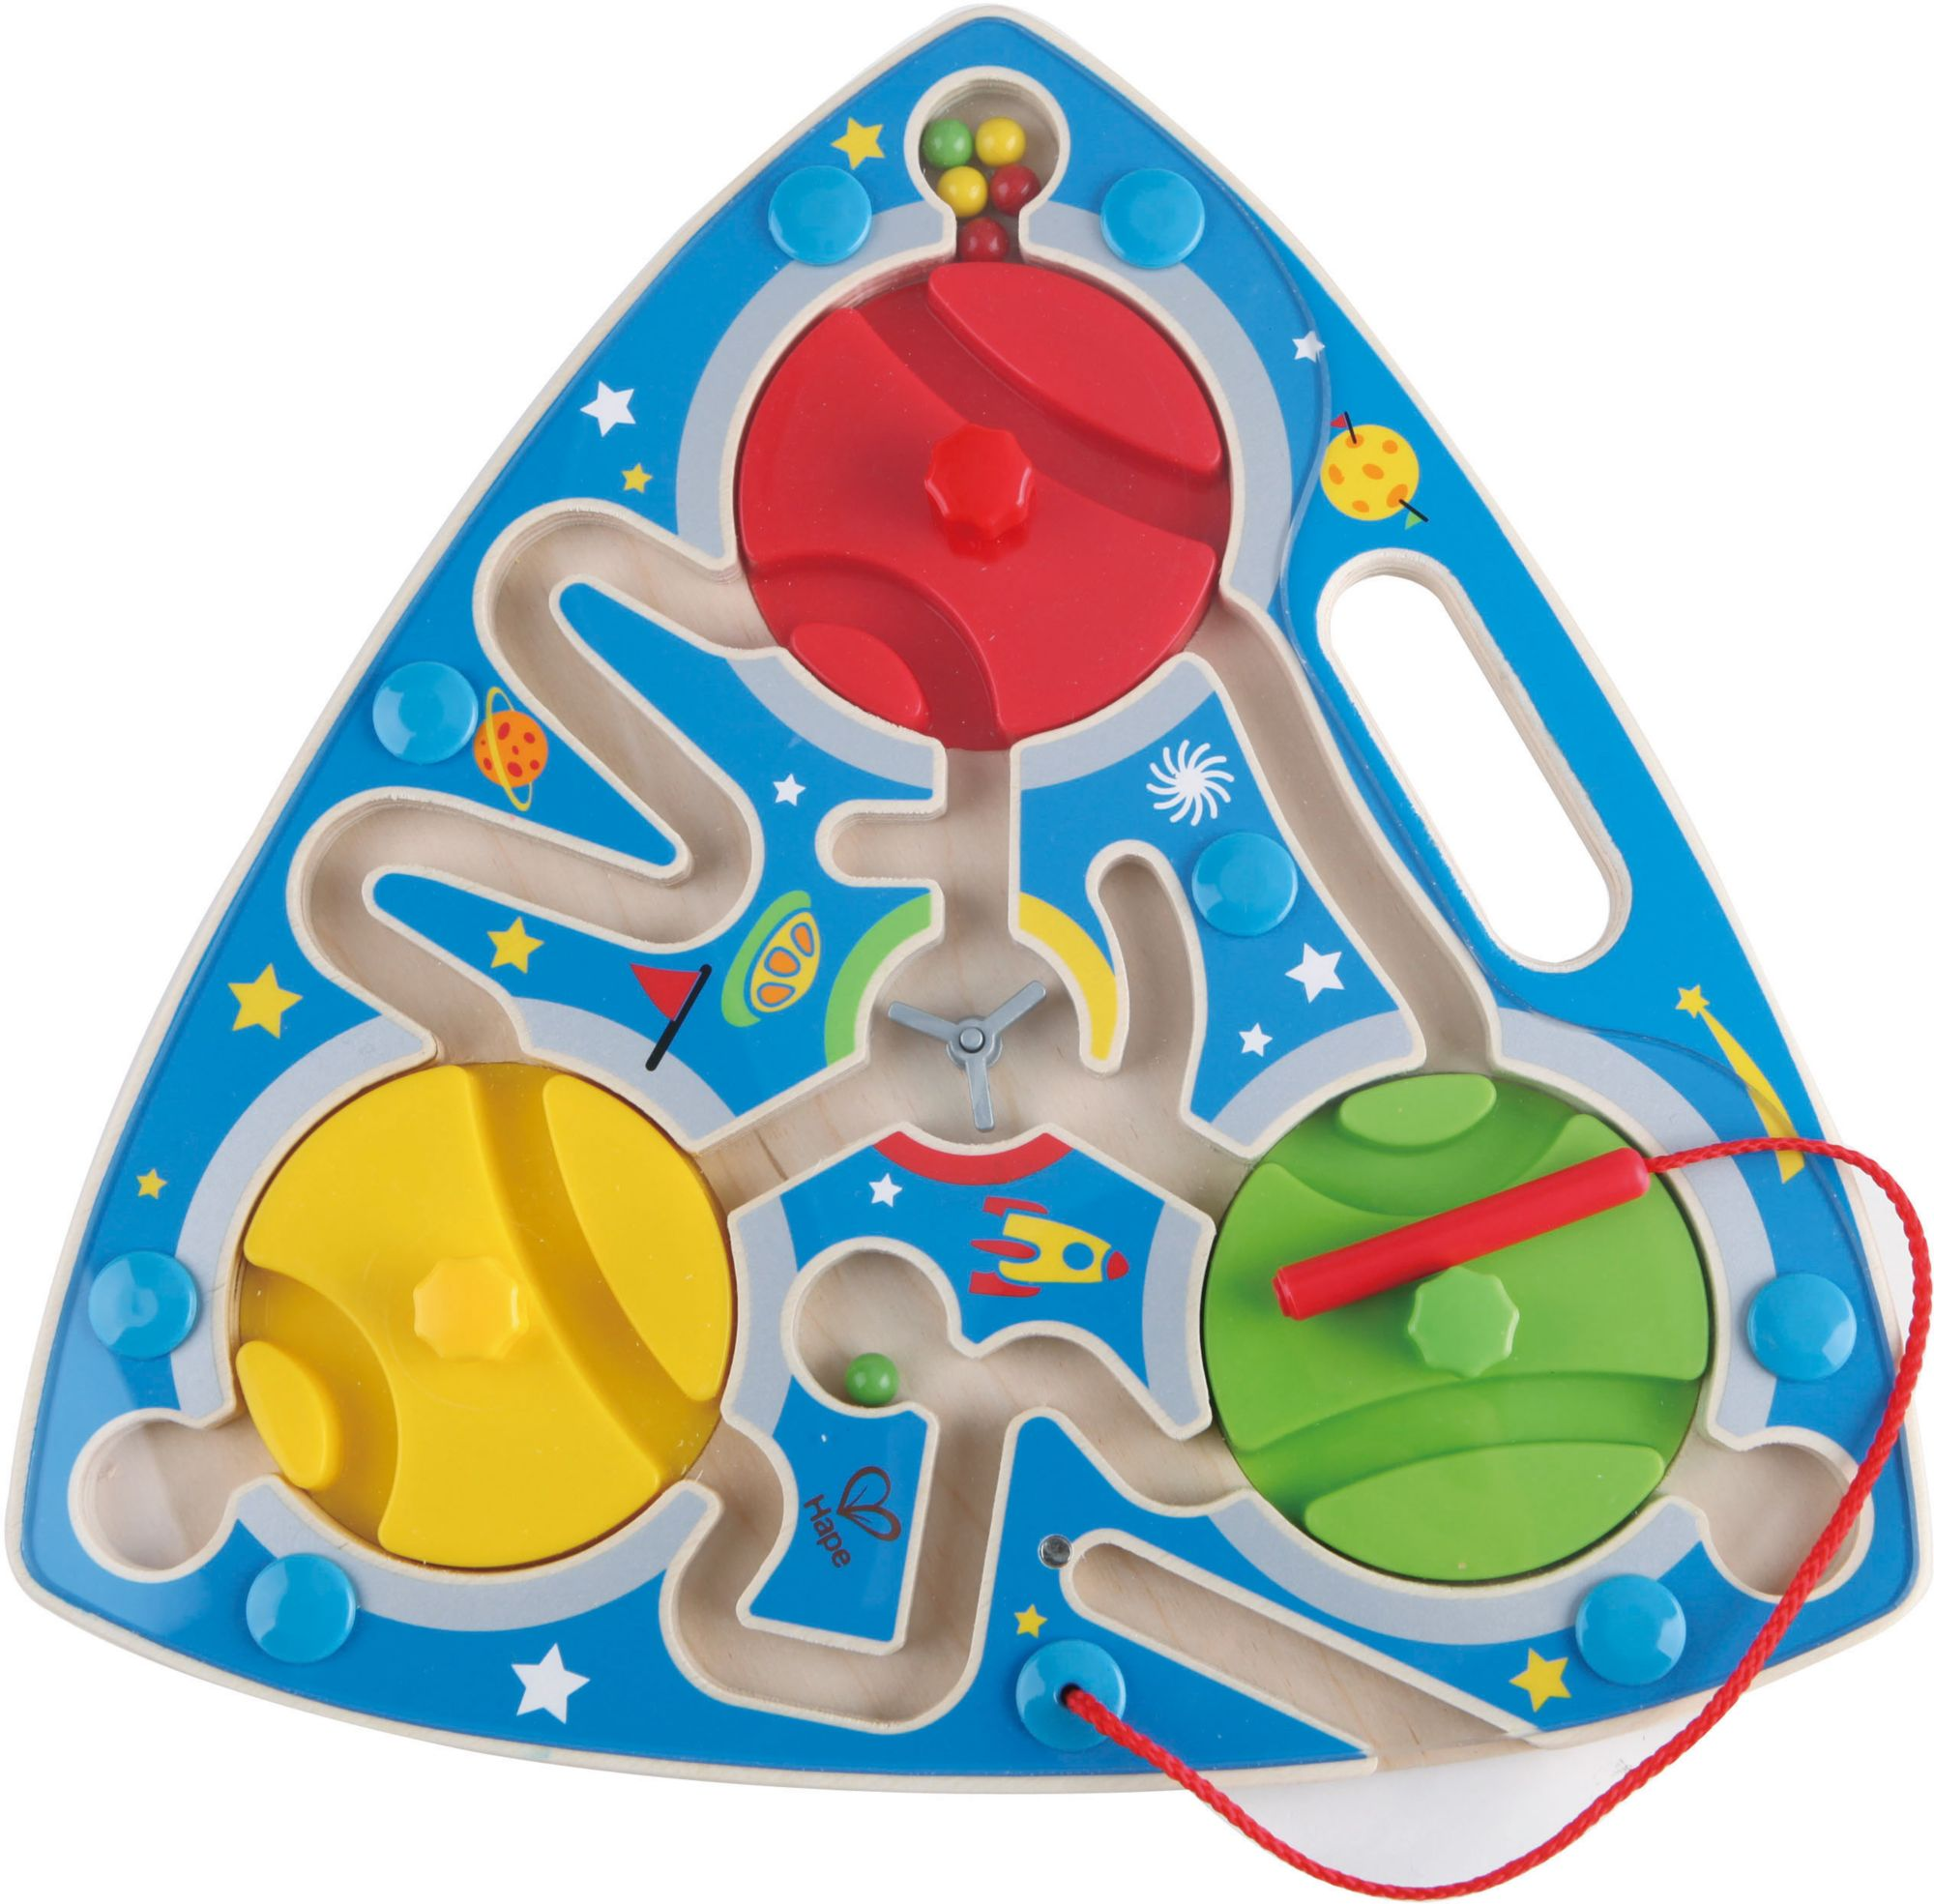 HAPE Hape Magnetspiel aus Holz, »Labyrinth Weltall«